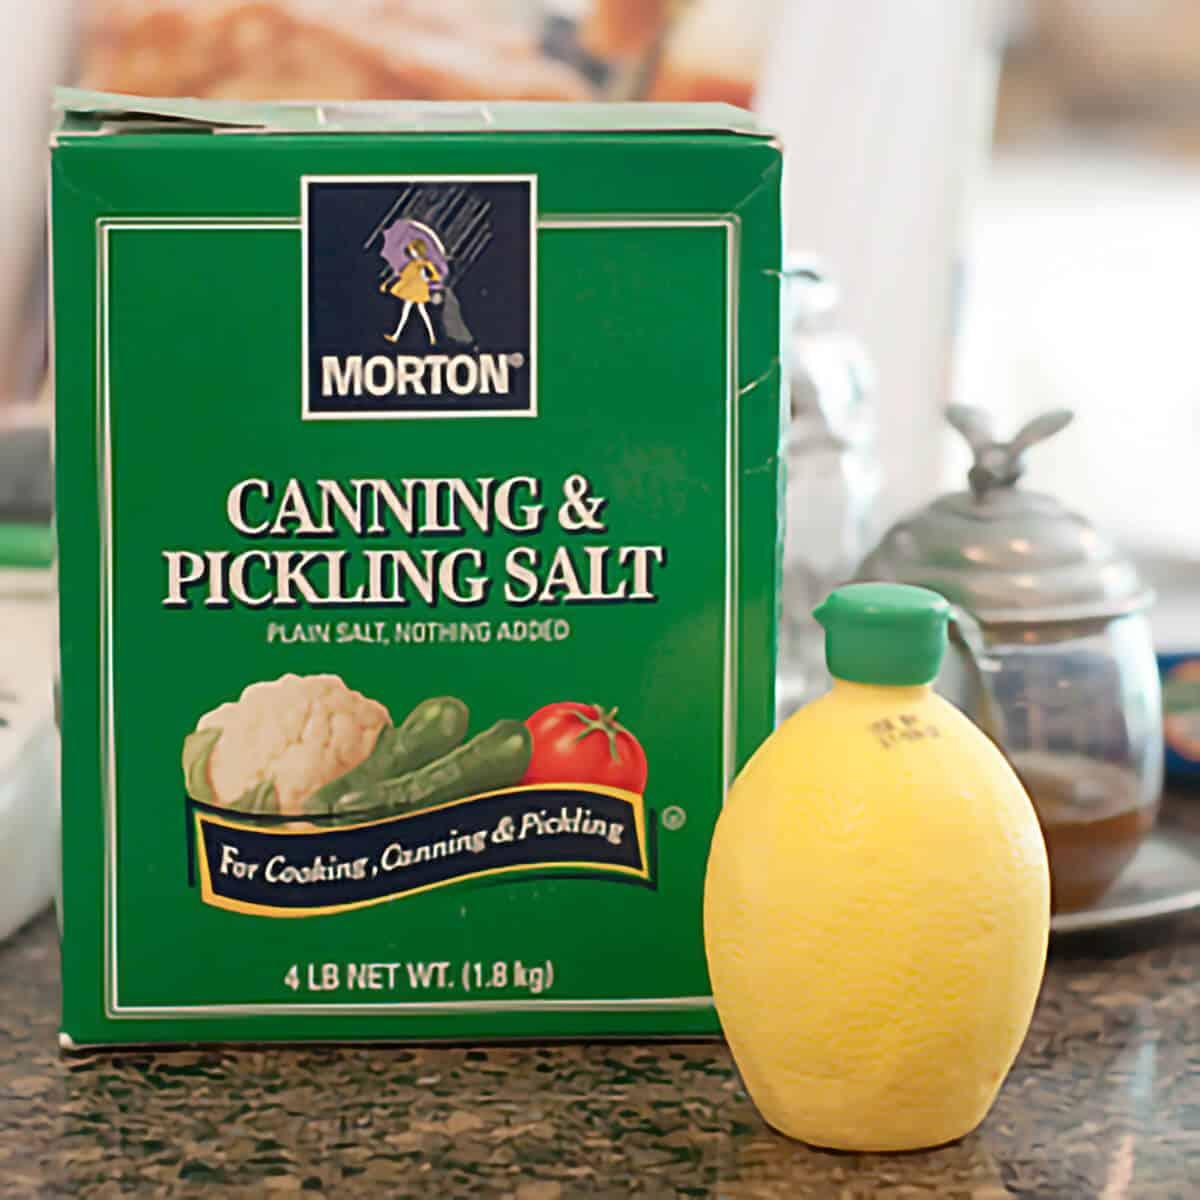 A box of pickling salt and bottled lemon juice.